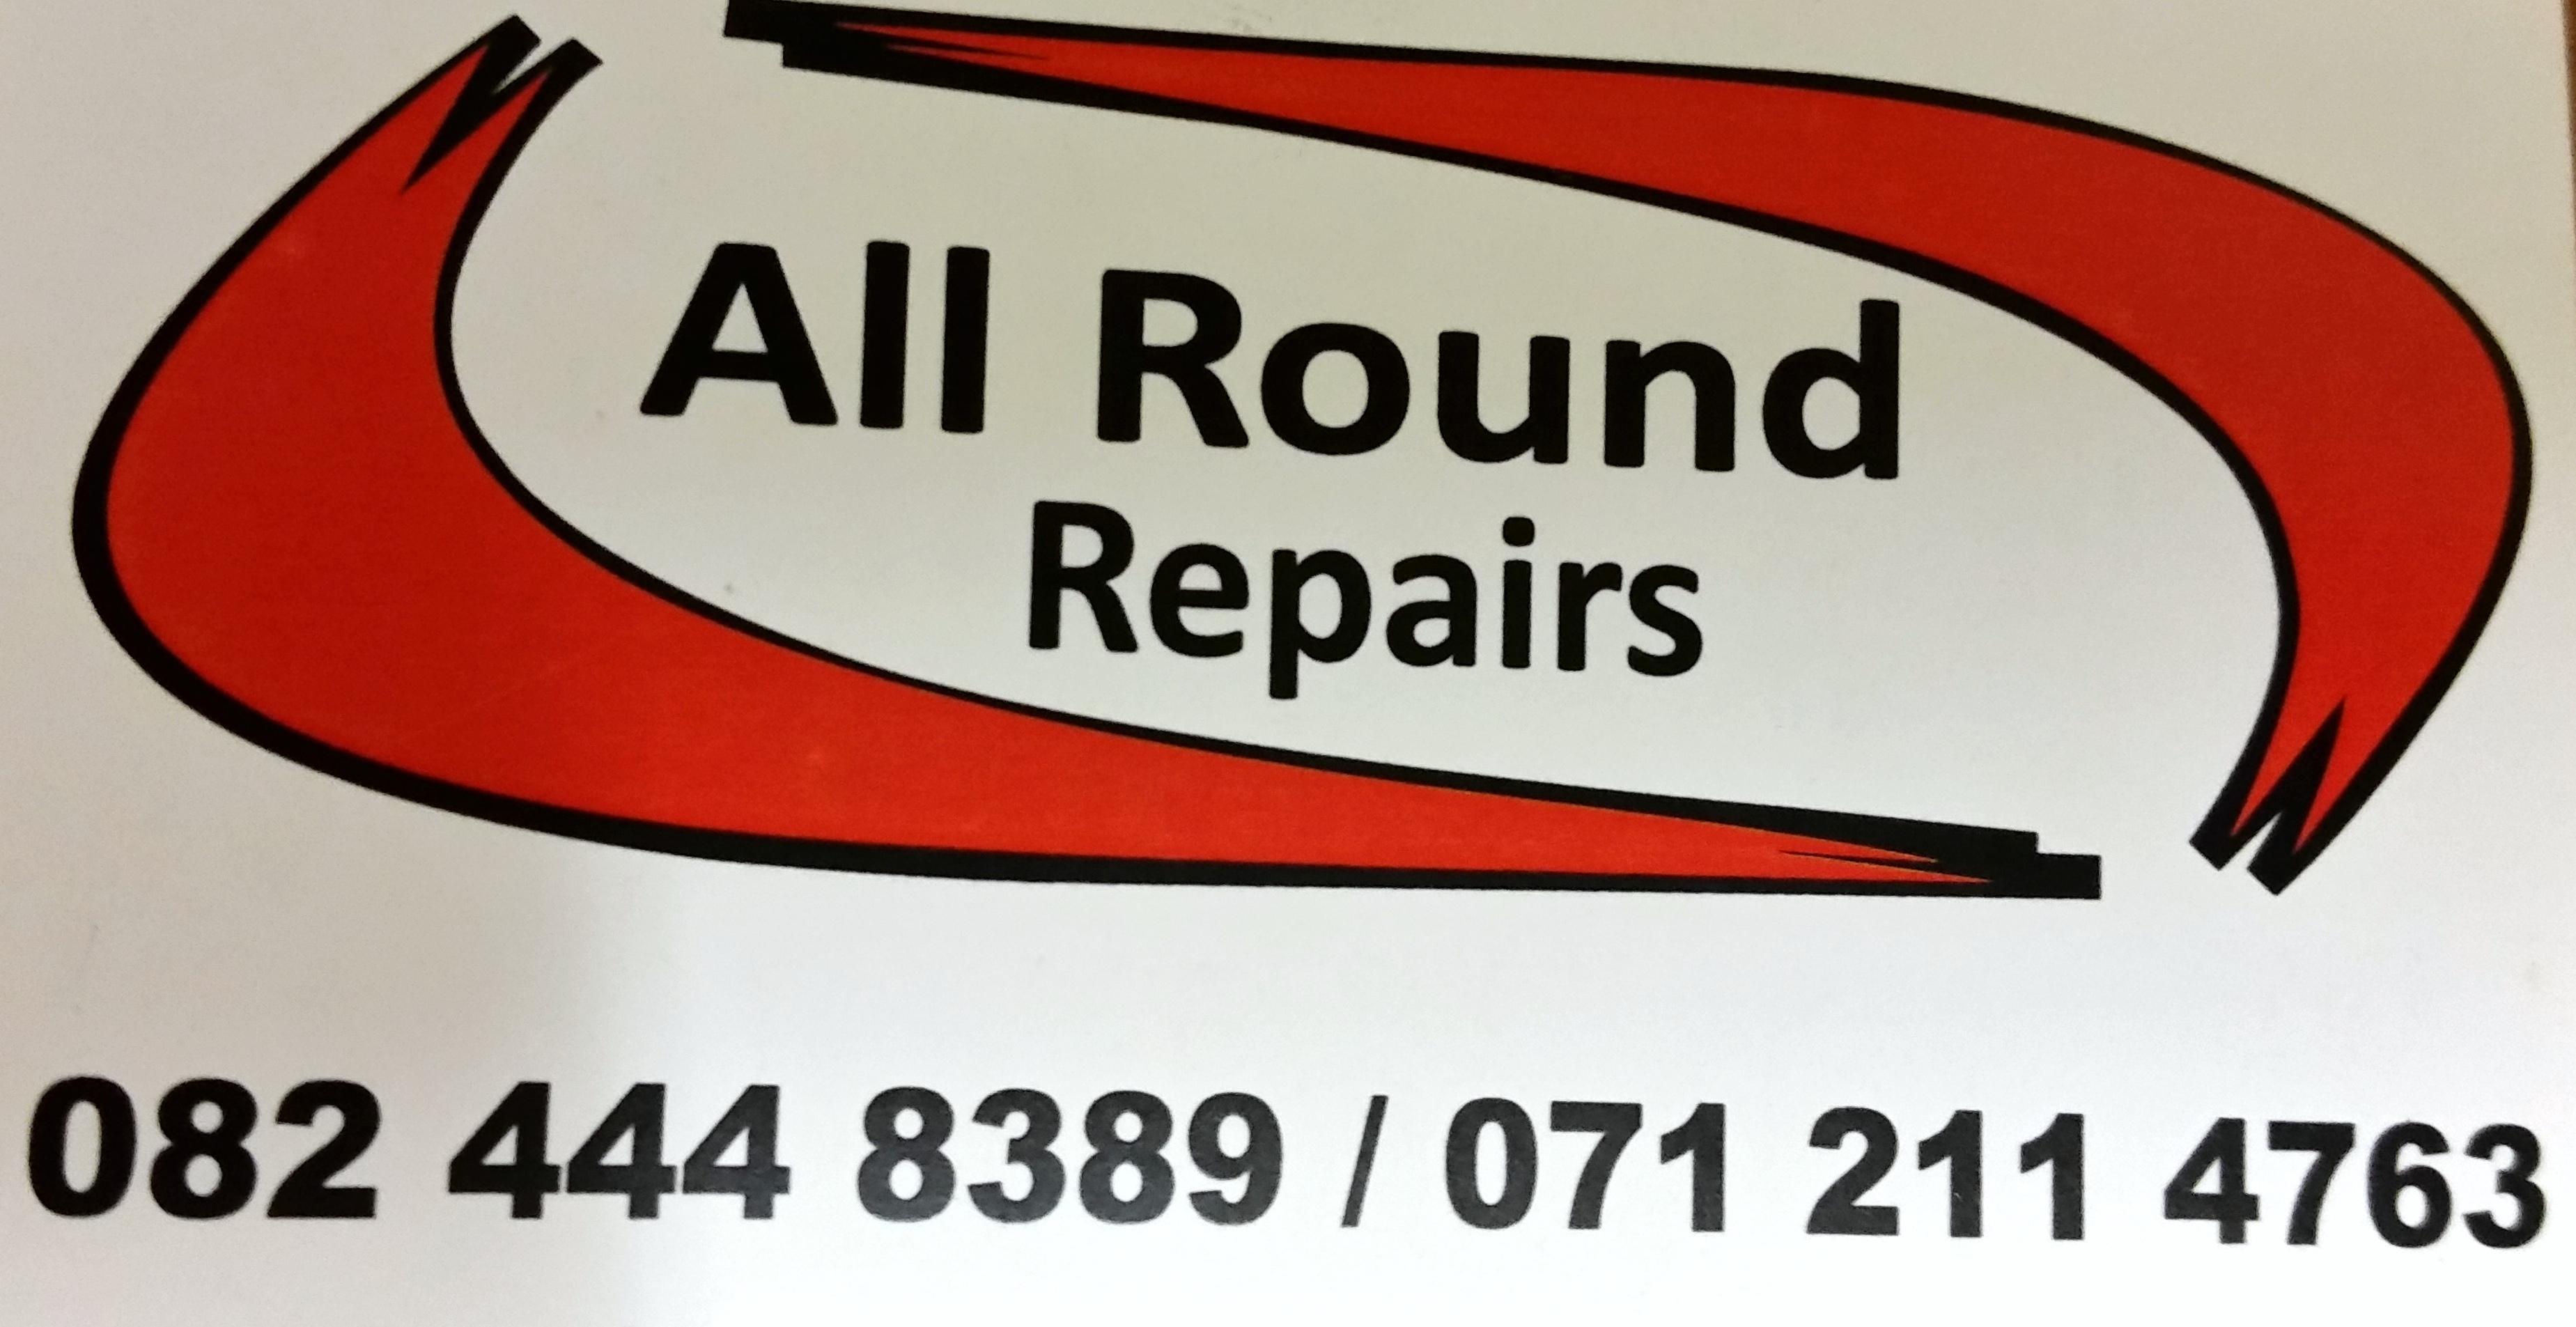 All Round Repairs | Kempton Park